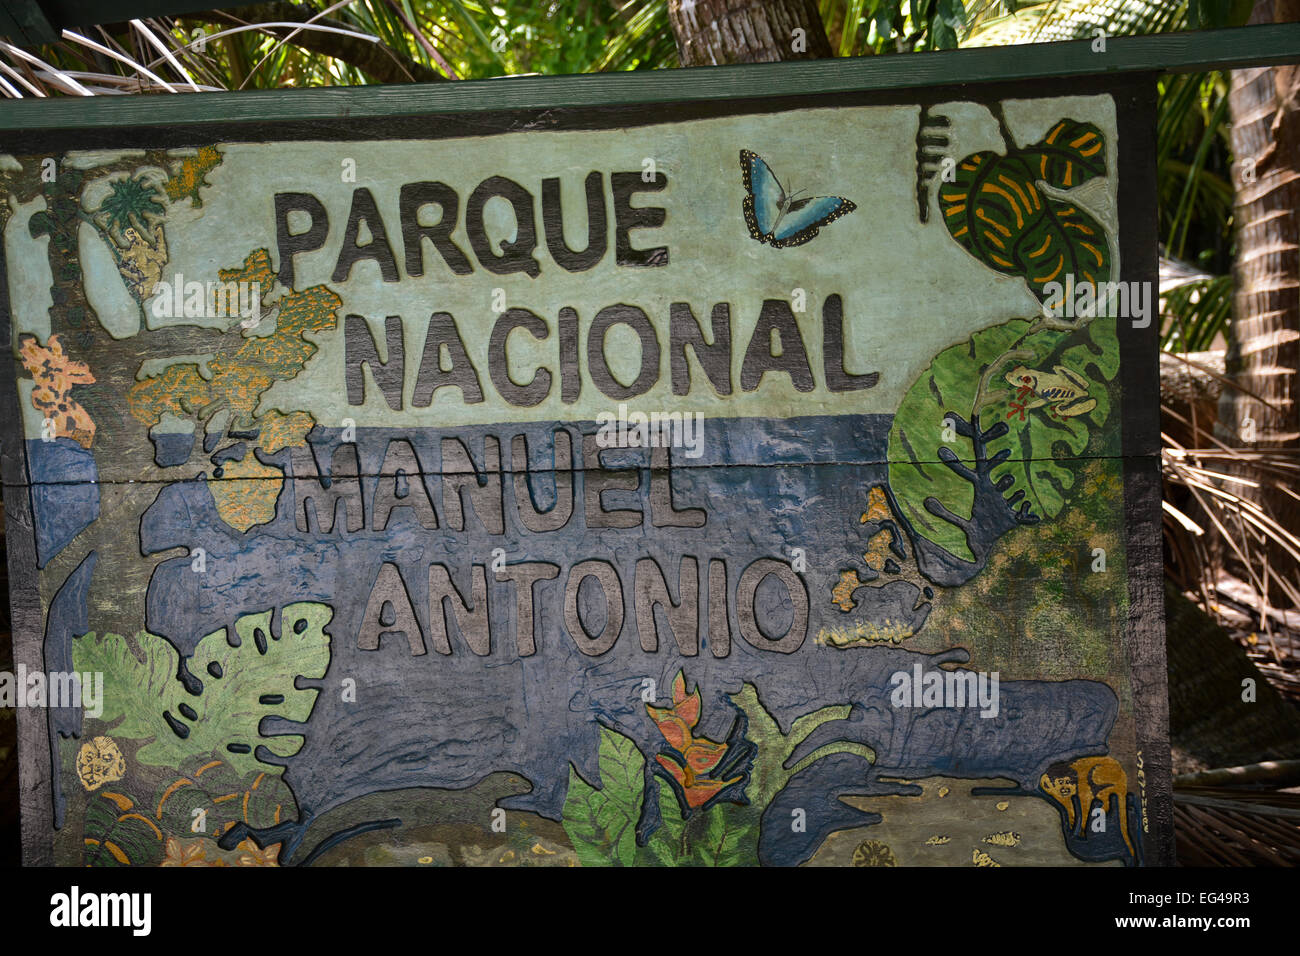 Manuel Antonio National Park Entrance Sign Stock Photo